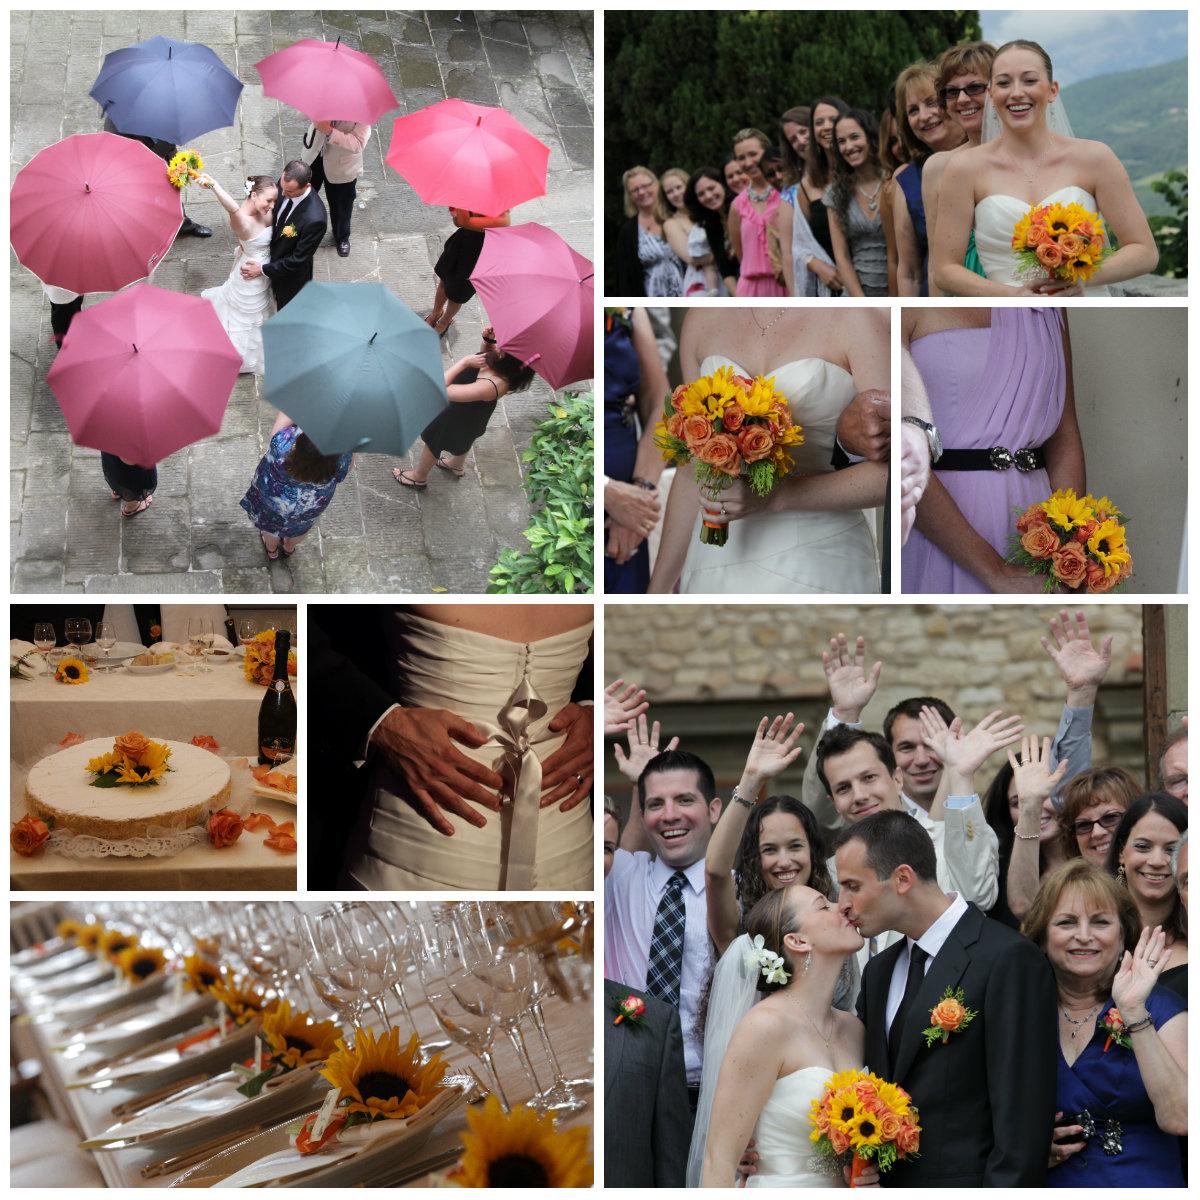 Intimate wedding in Chianti castle